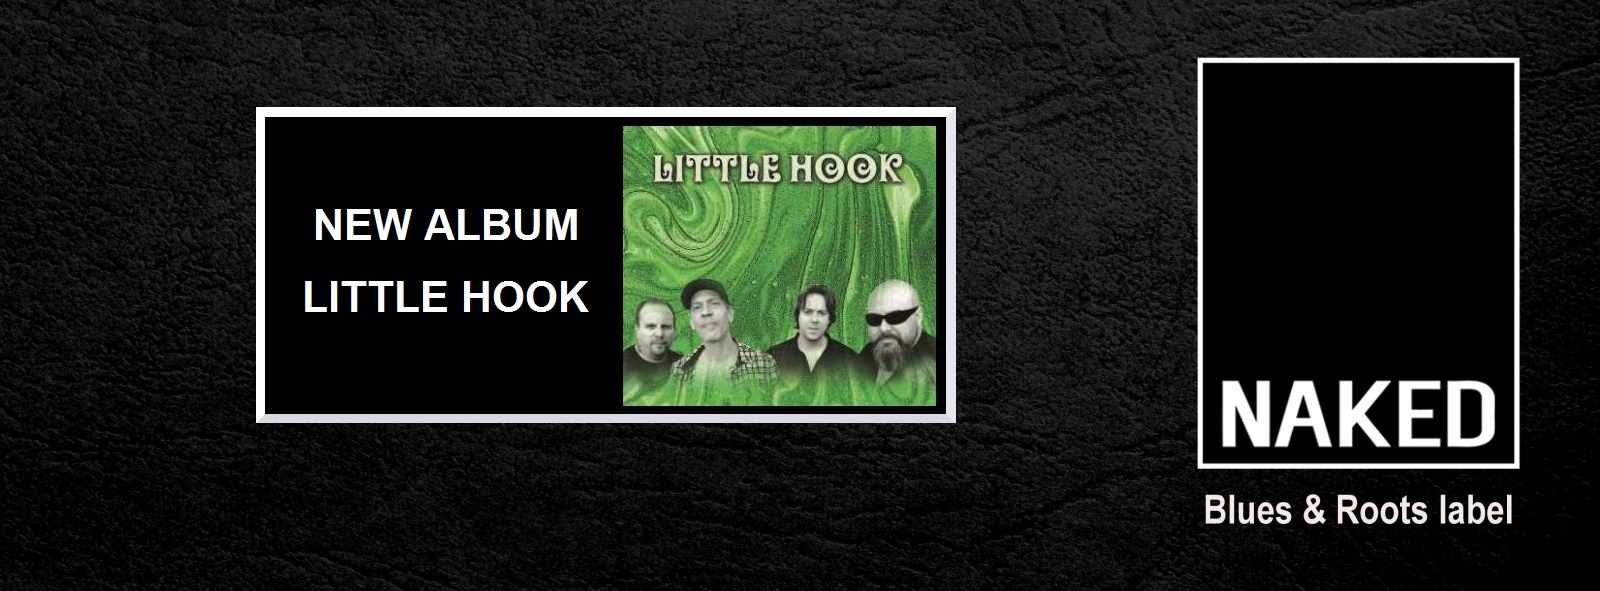 Little Hook new album